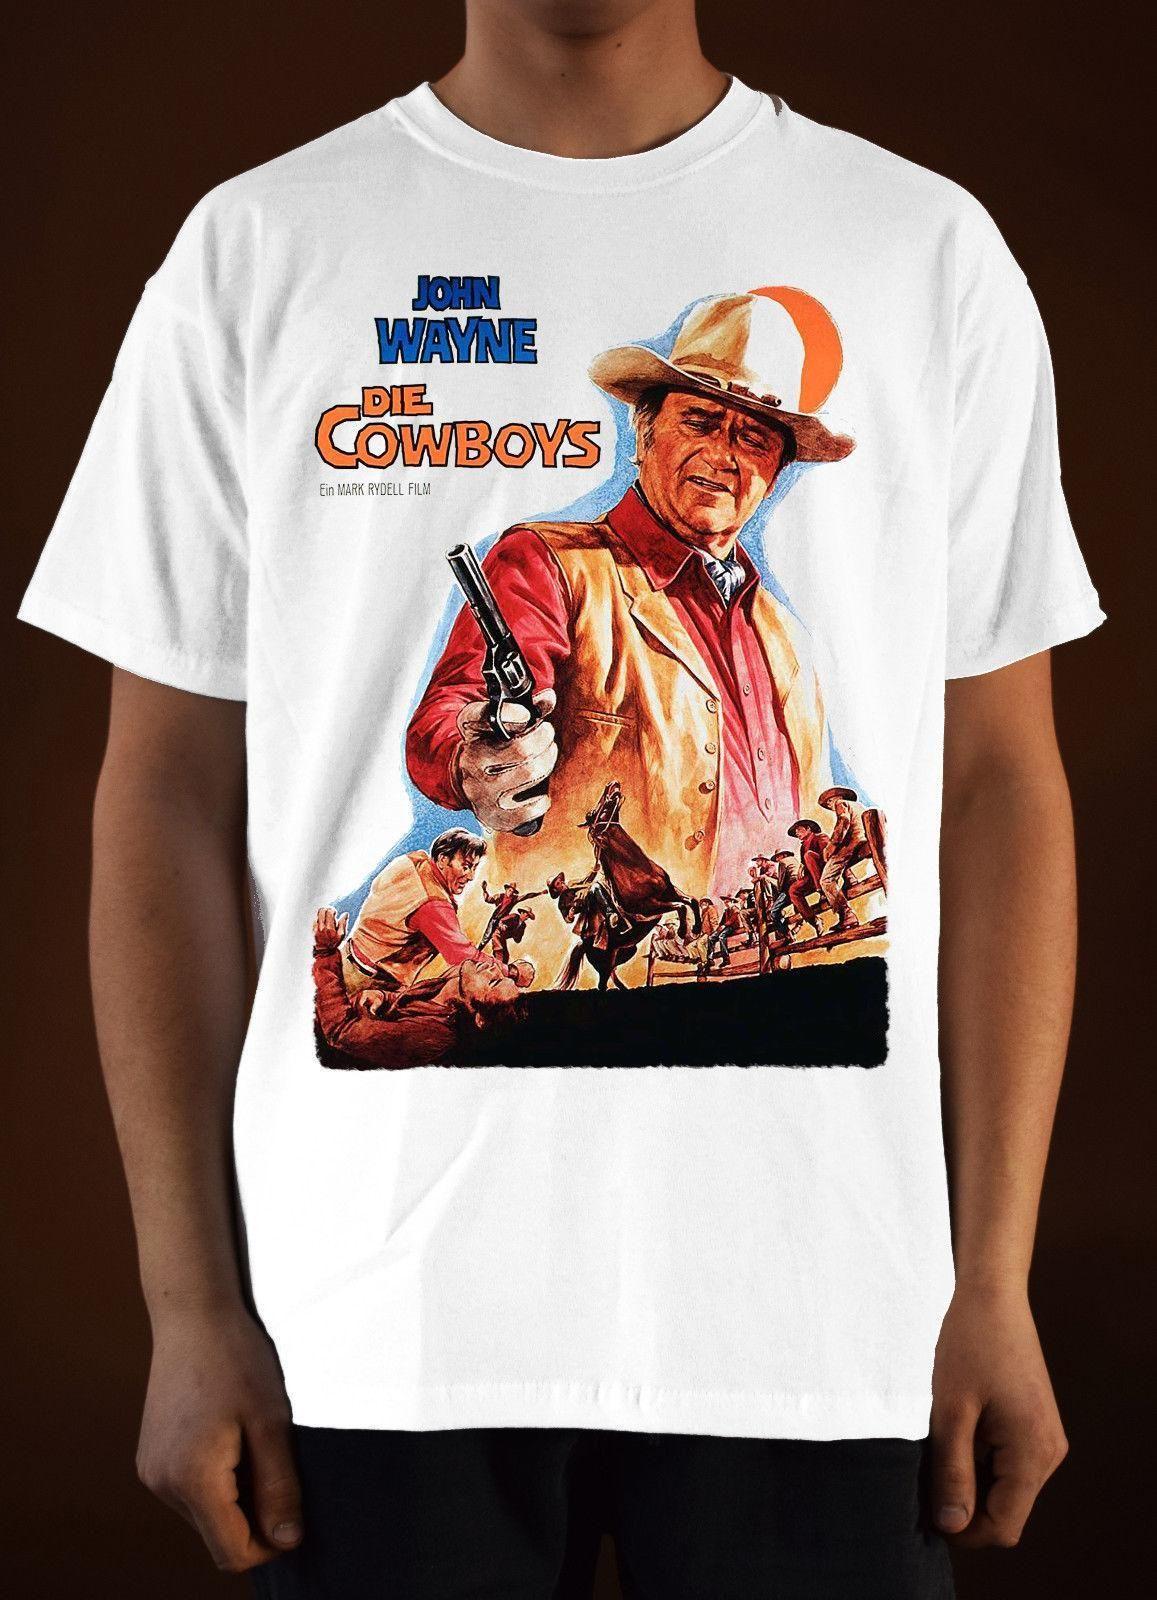 9cd6a9cb DIE COWBOYS Ver. 1 John Wayne T Shirt White S 5XL 24 Hour T Shirt Rude  Tshirts From Amesion91, $12.08| DHgate.Com